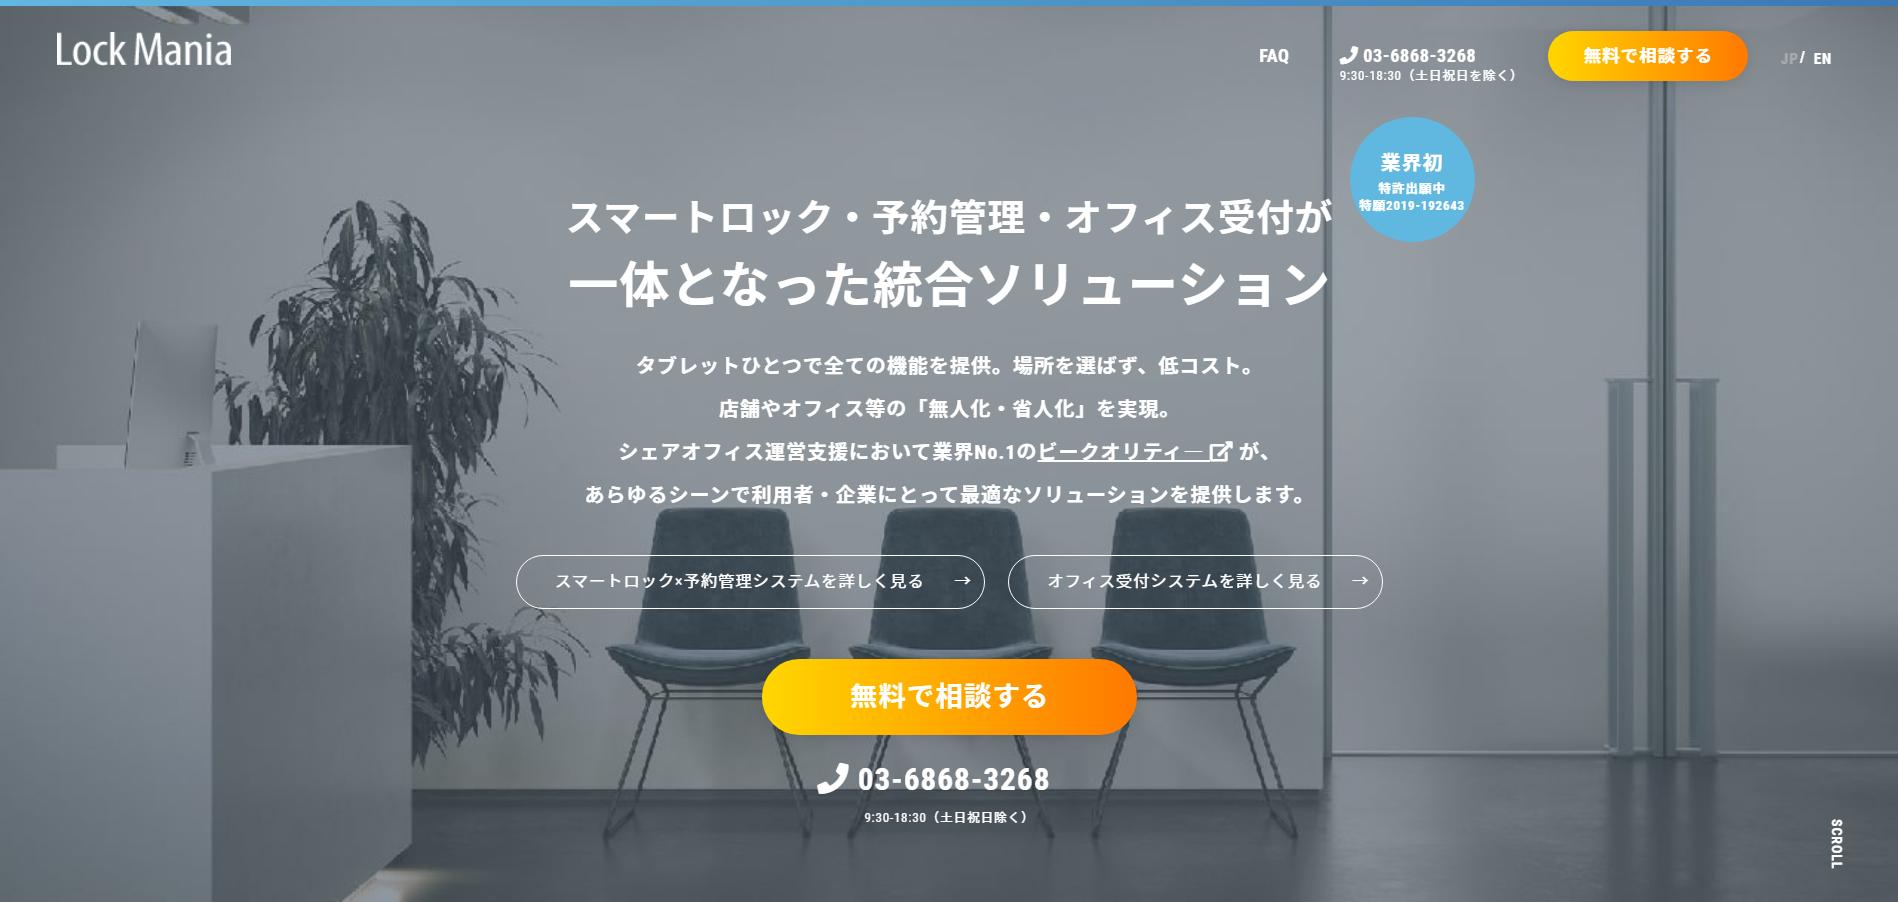 Lock Maniaの公式サイトトップページ画像